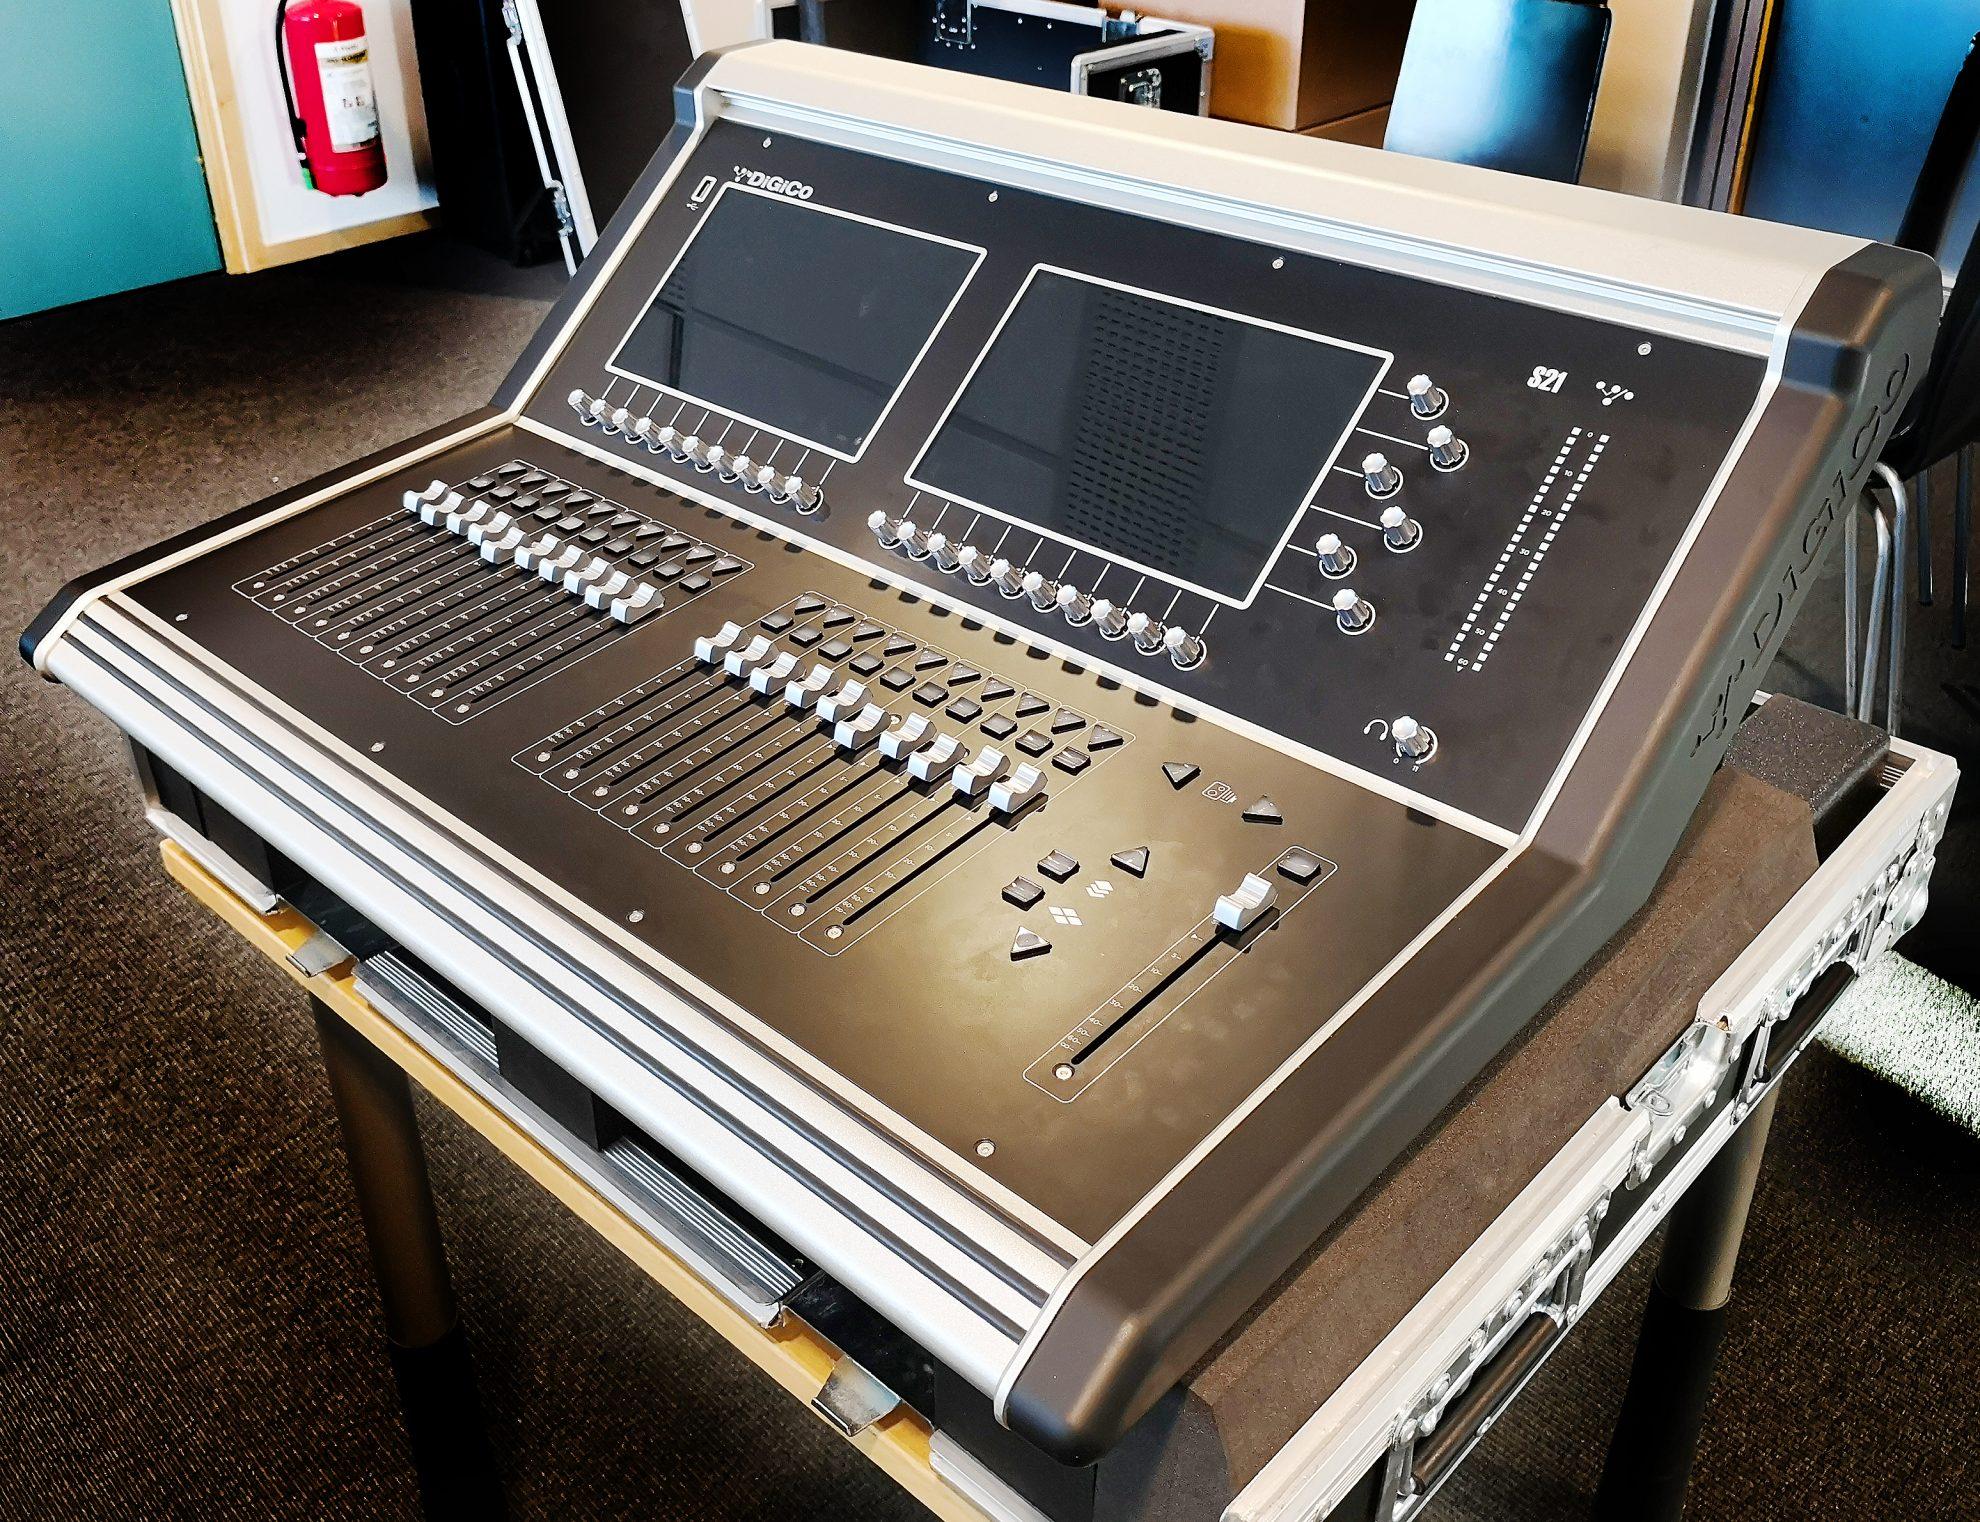 digico s21 digital mixer gearwise used av stage equipment. Black Bedroom Furniture Sets. Home Design Ideas